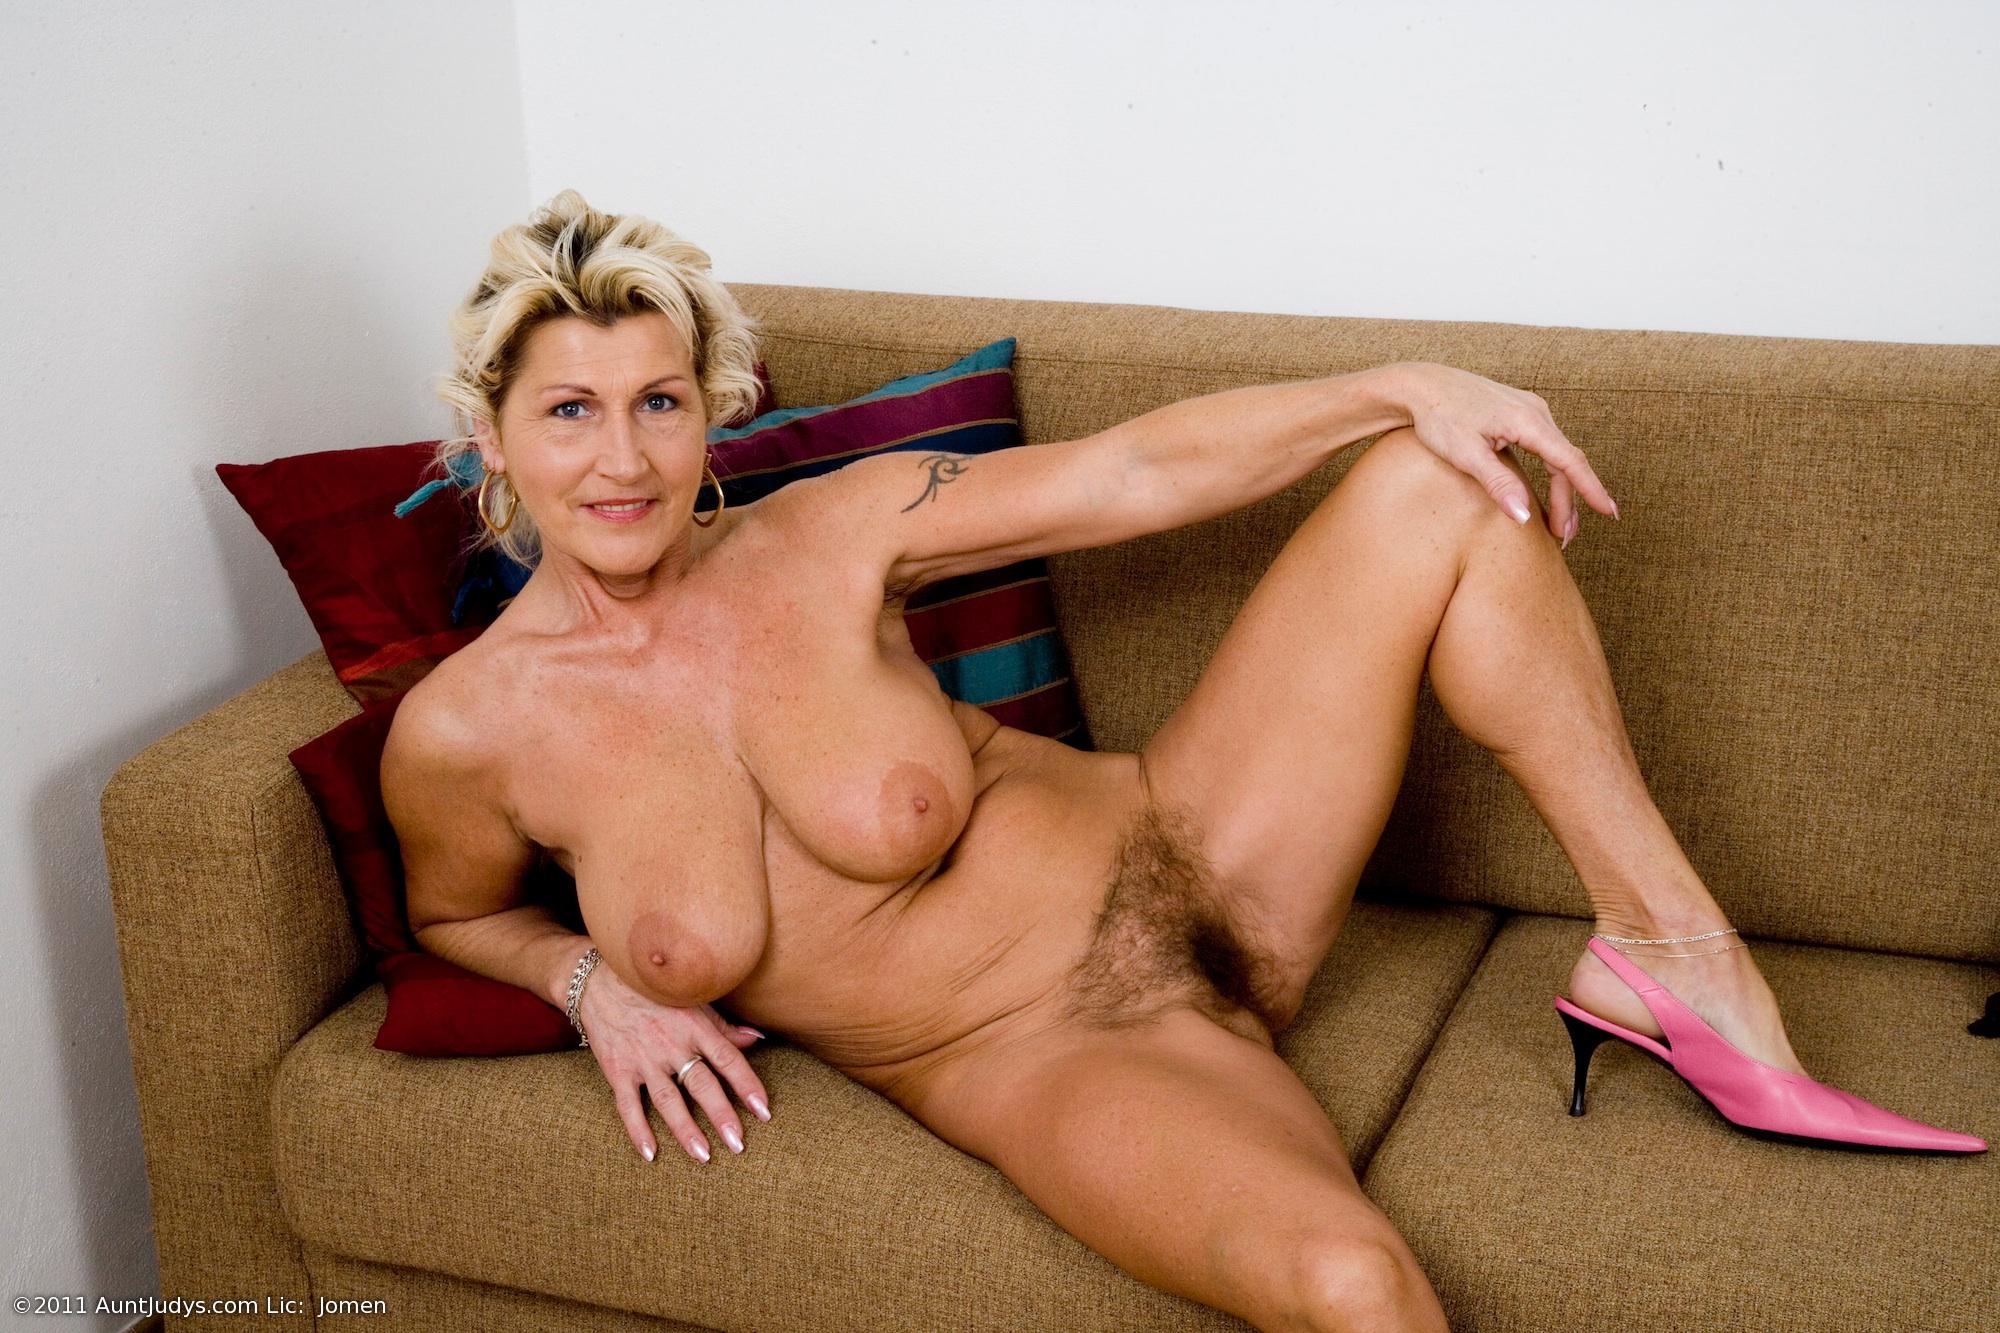 Mila jovovich tits